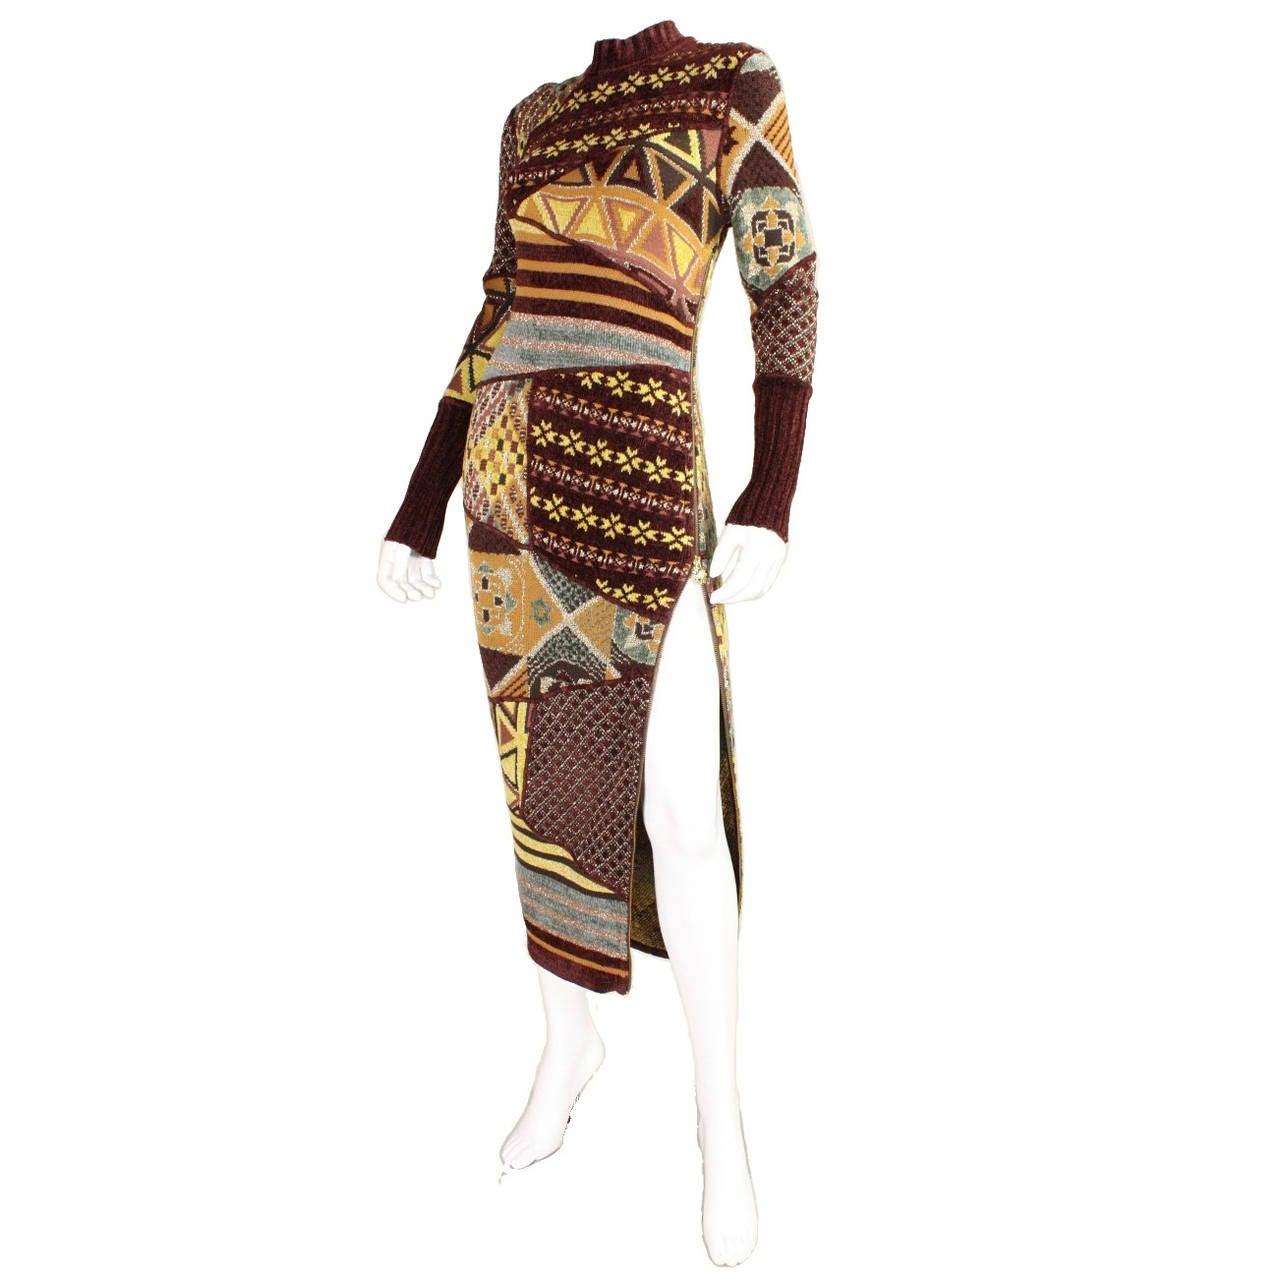 1990's Christian Lacroix Patchwork Knit Gown 1